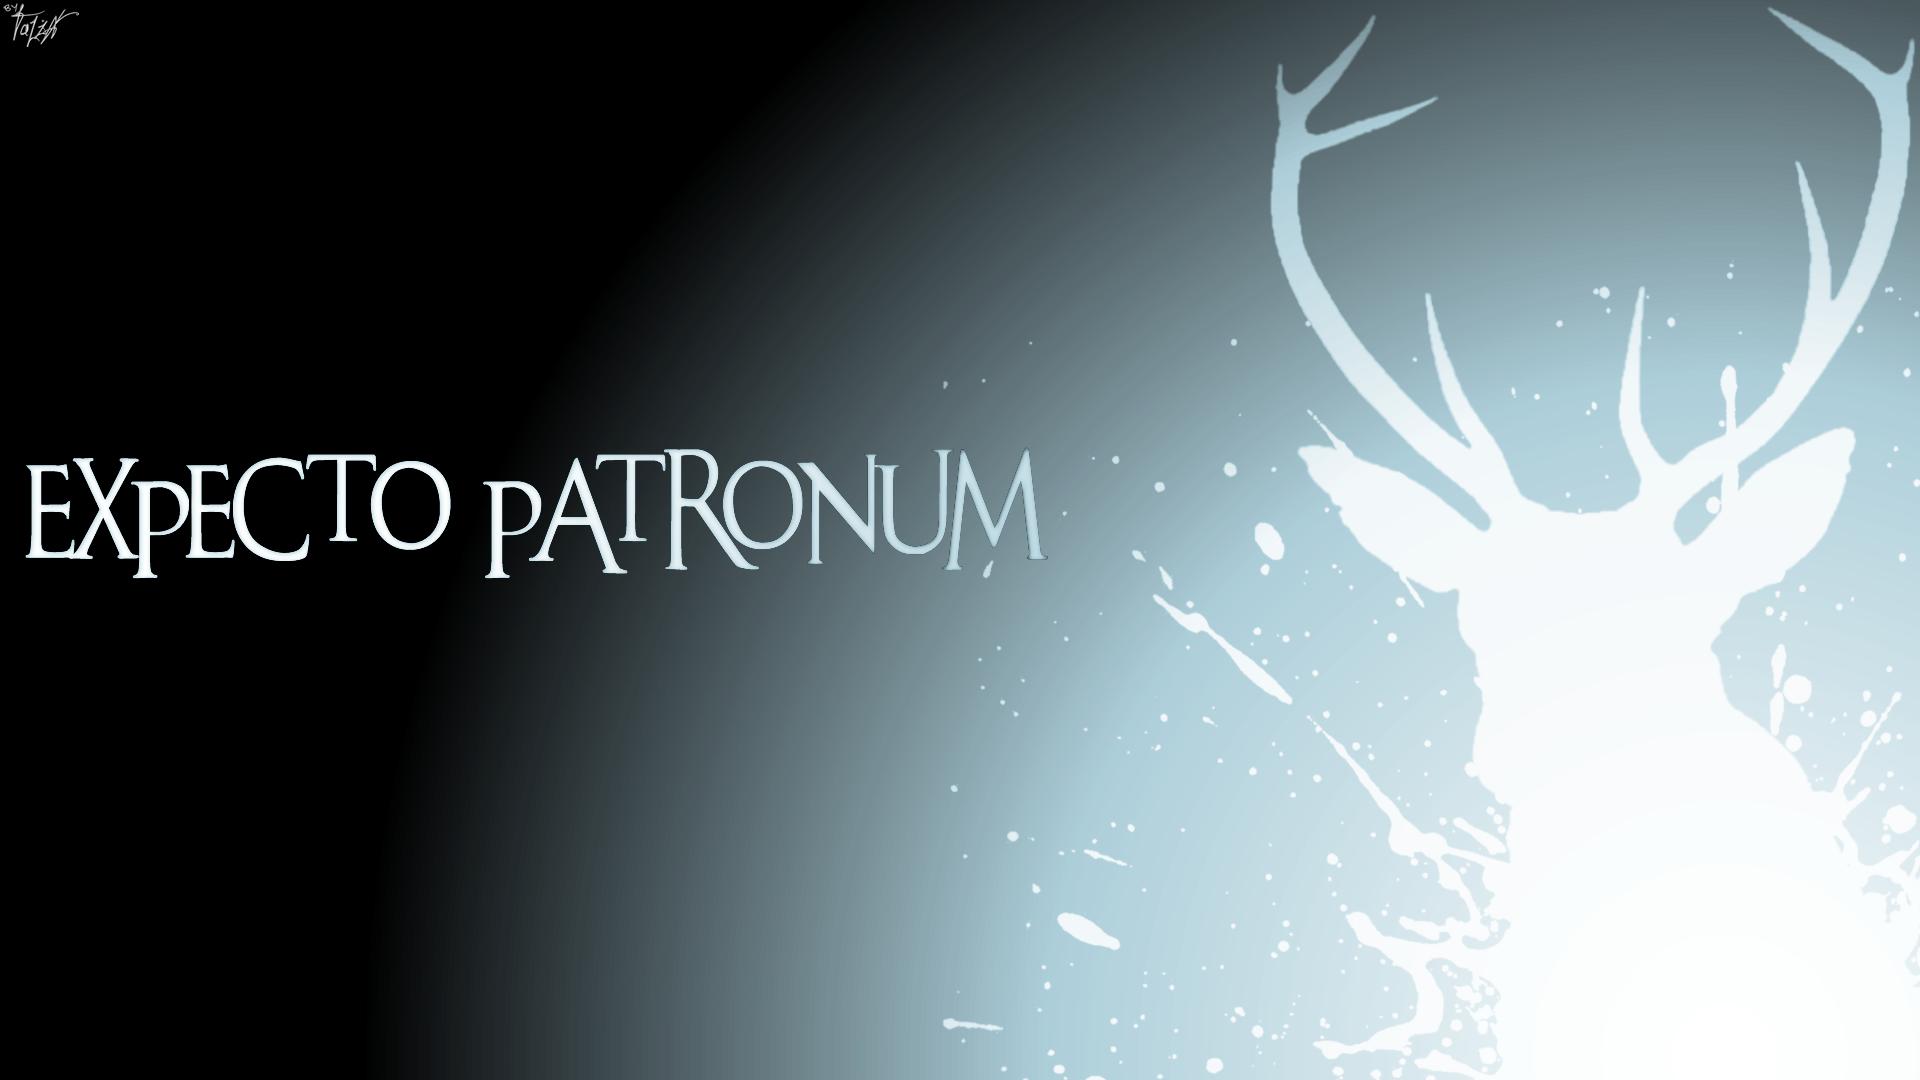 Amazing Wallpaper Harry Potter Expecto Patronum - 556236  Image_47910.jpg